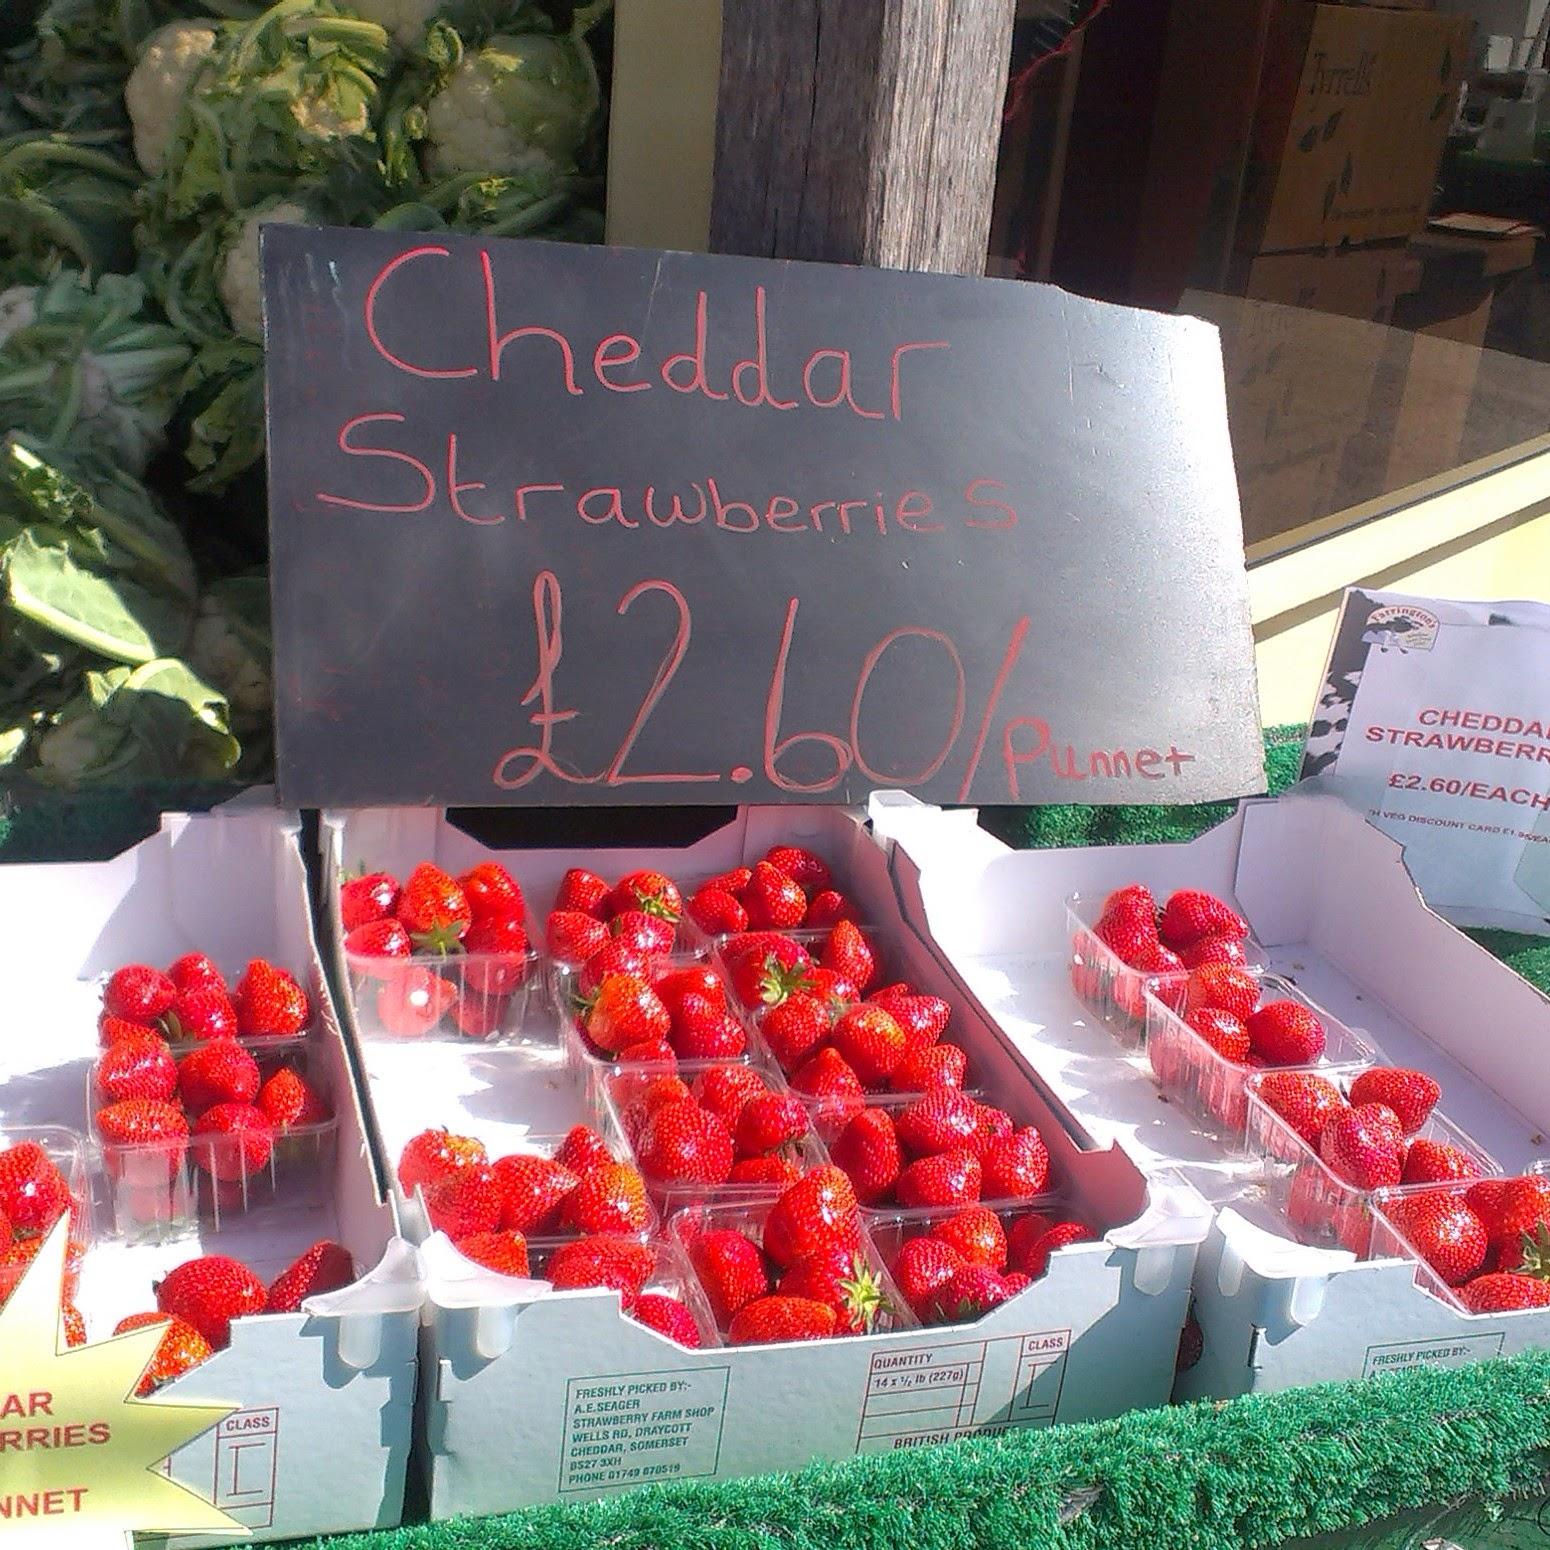 Cheddar strawberries at Farringtons Farm Shop